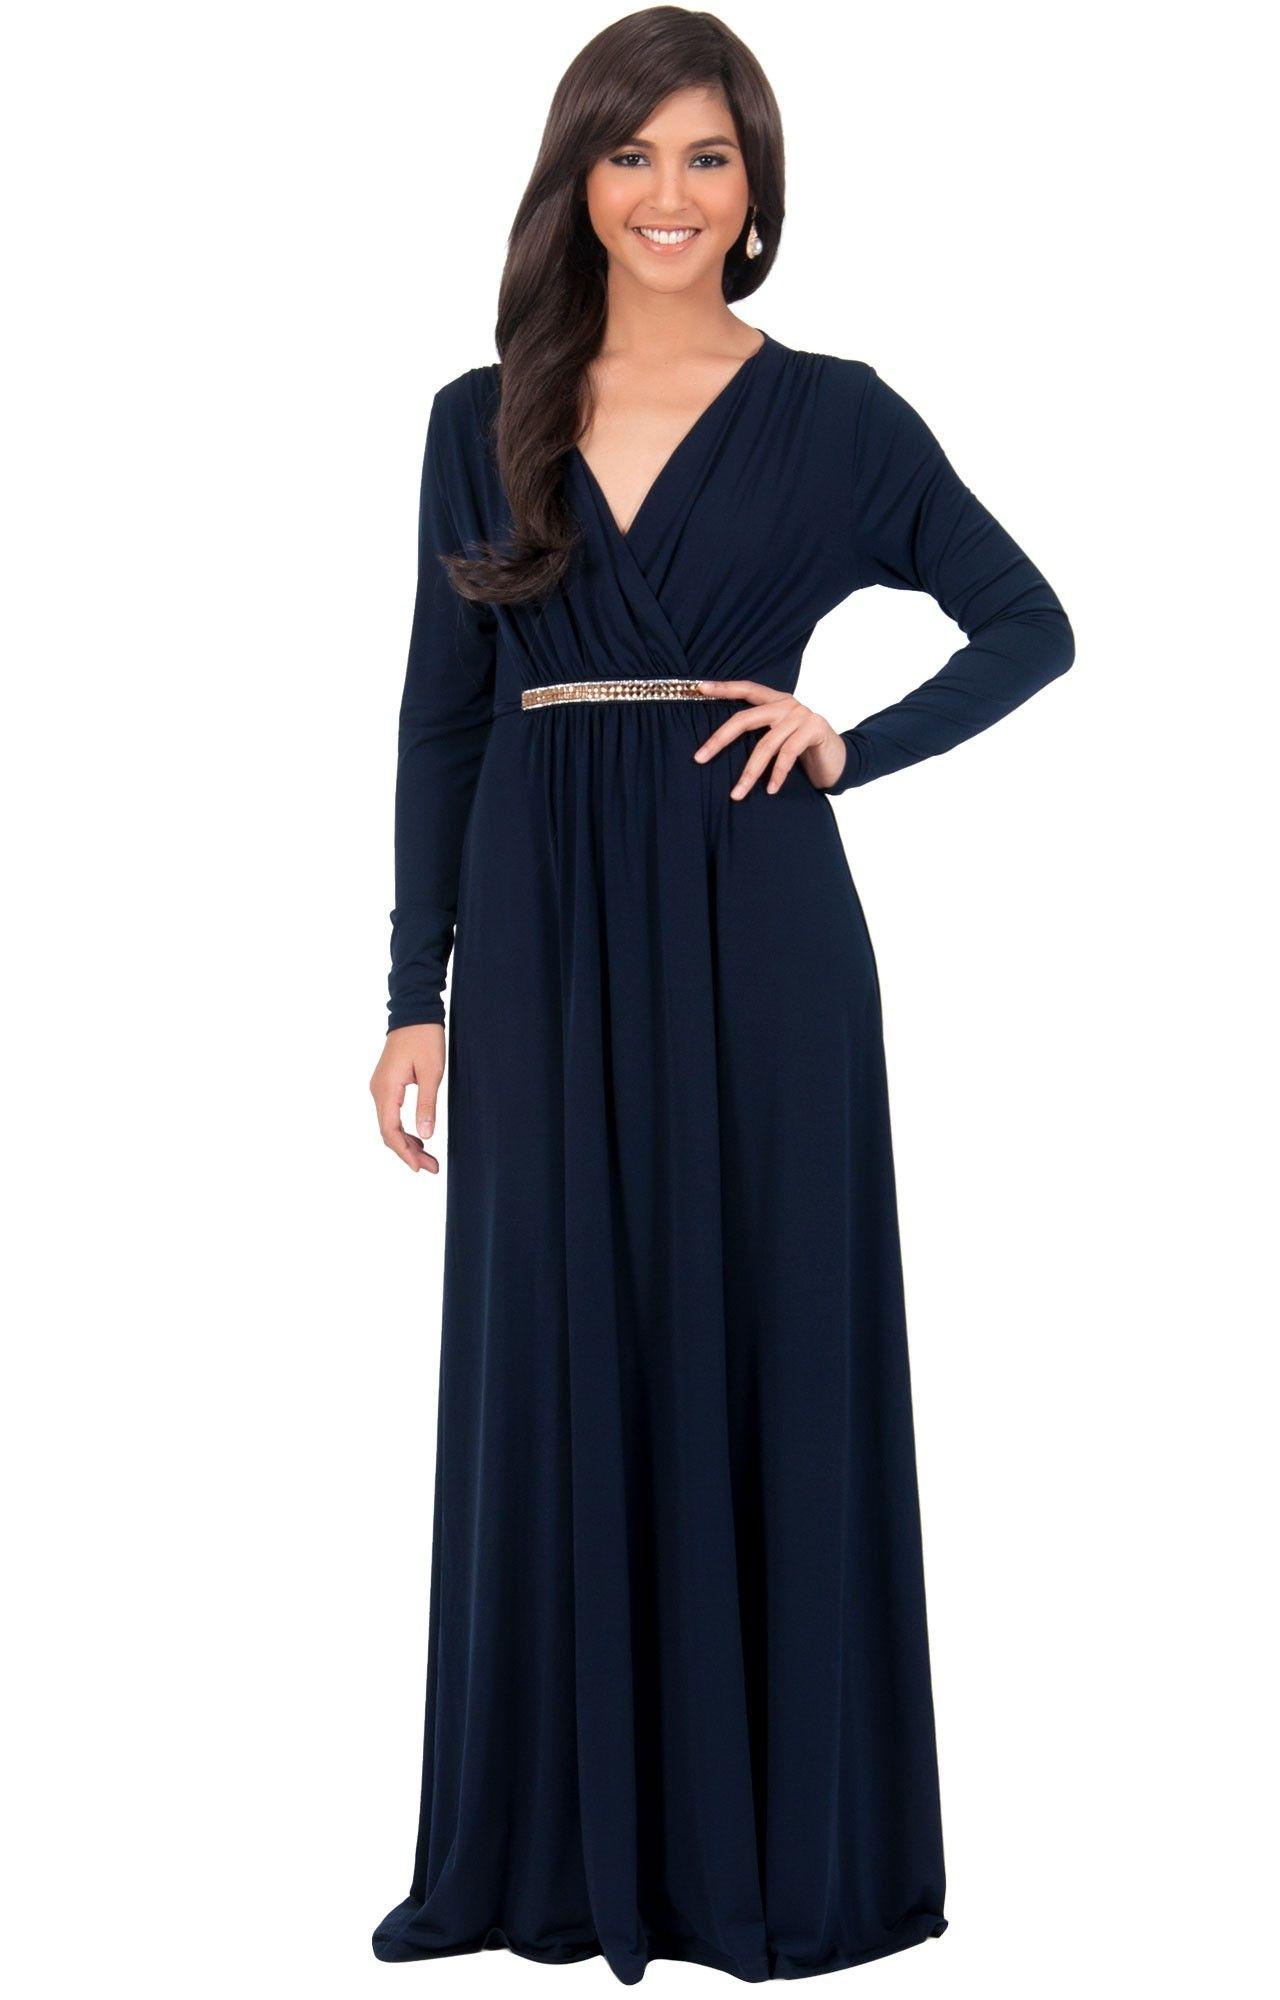 Tiffany Long Sleeve Kaftan Fall Flowy V Neck Maxi Dress Gown Abaya Long Sleeve Maxi Dress Dresses Gowns [ 2000 x 1280 Pixel ]